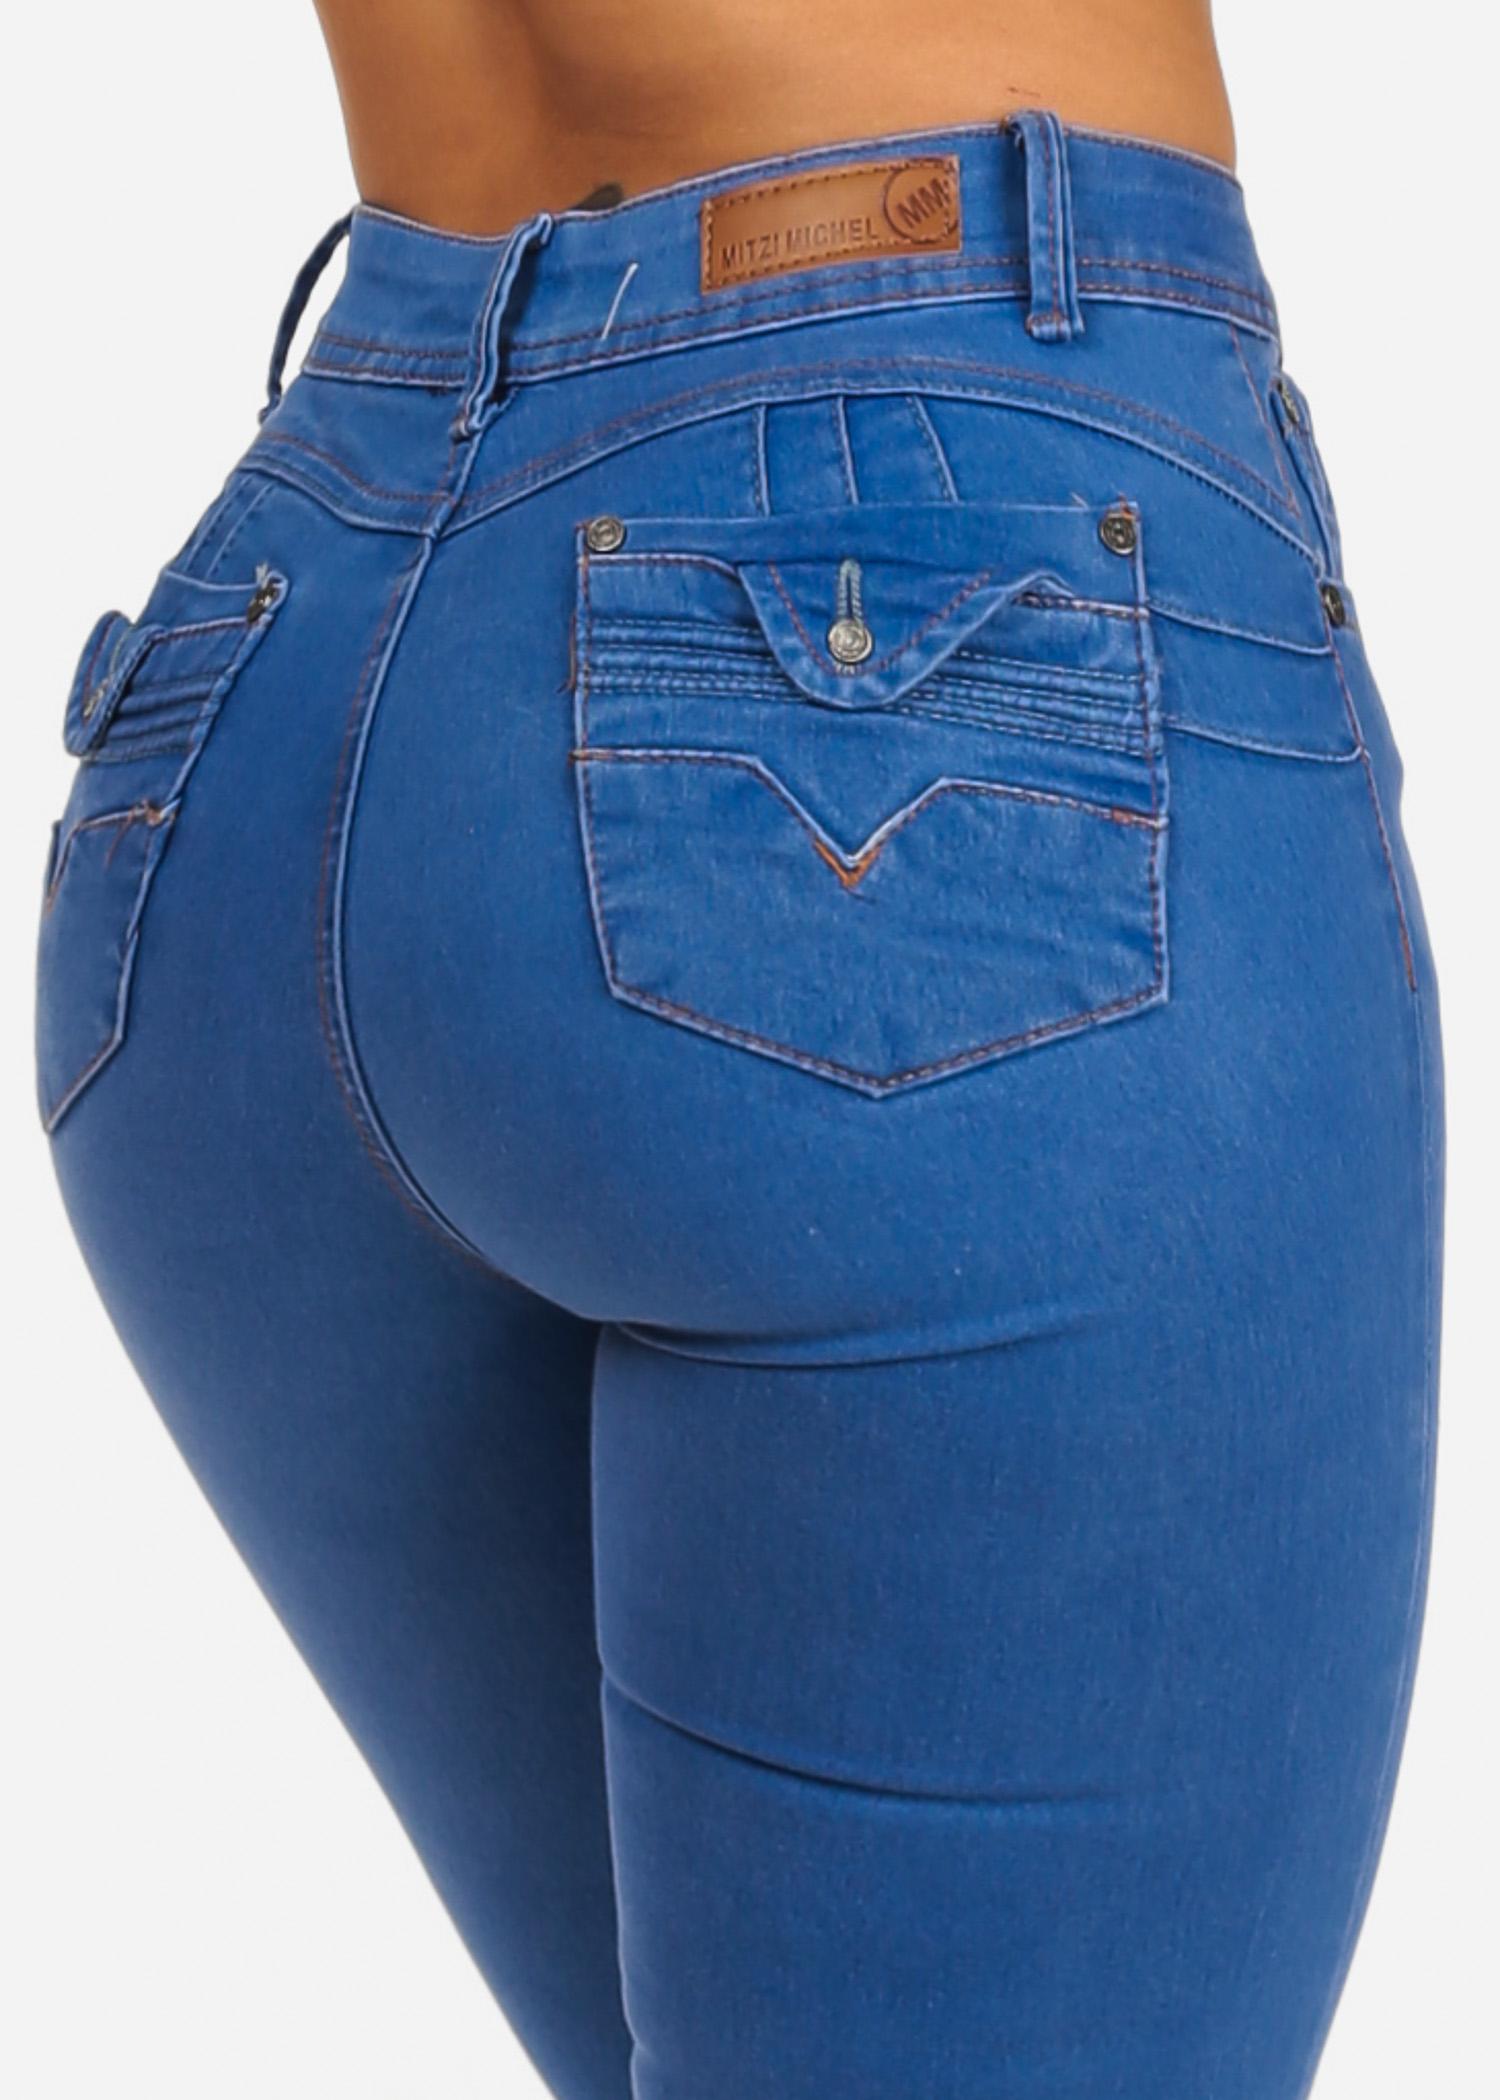 Womens Juniors Light Blue Wash High Waisted Butt Lifting Levanta Cola Push Up Stretchy Skinny Jeans 10245V